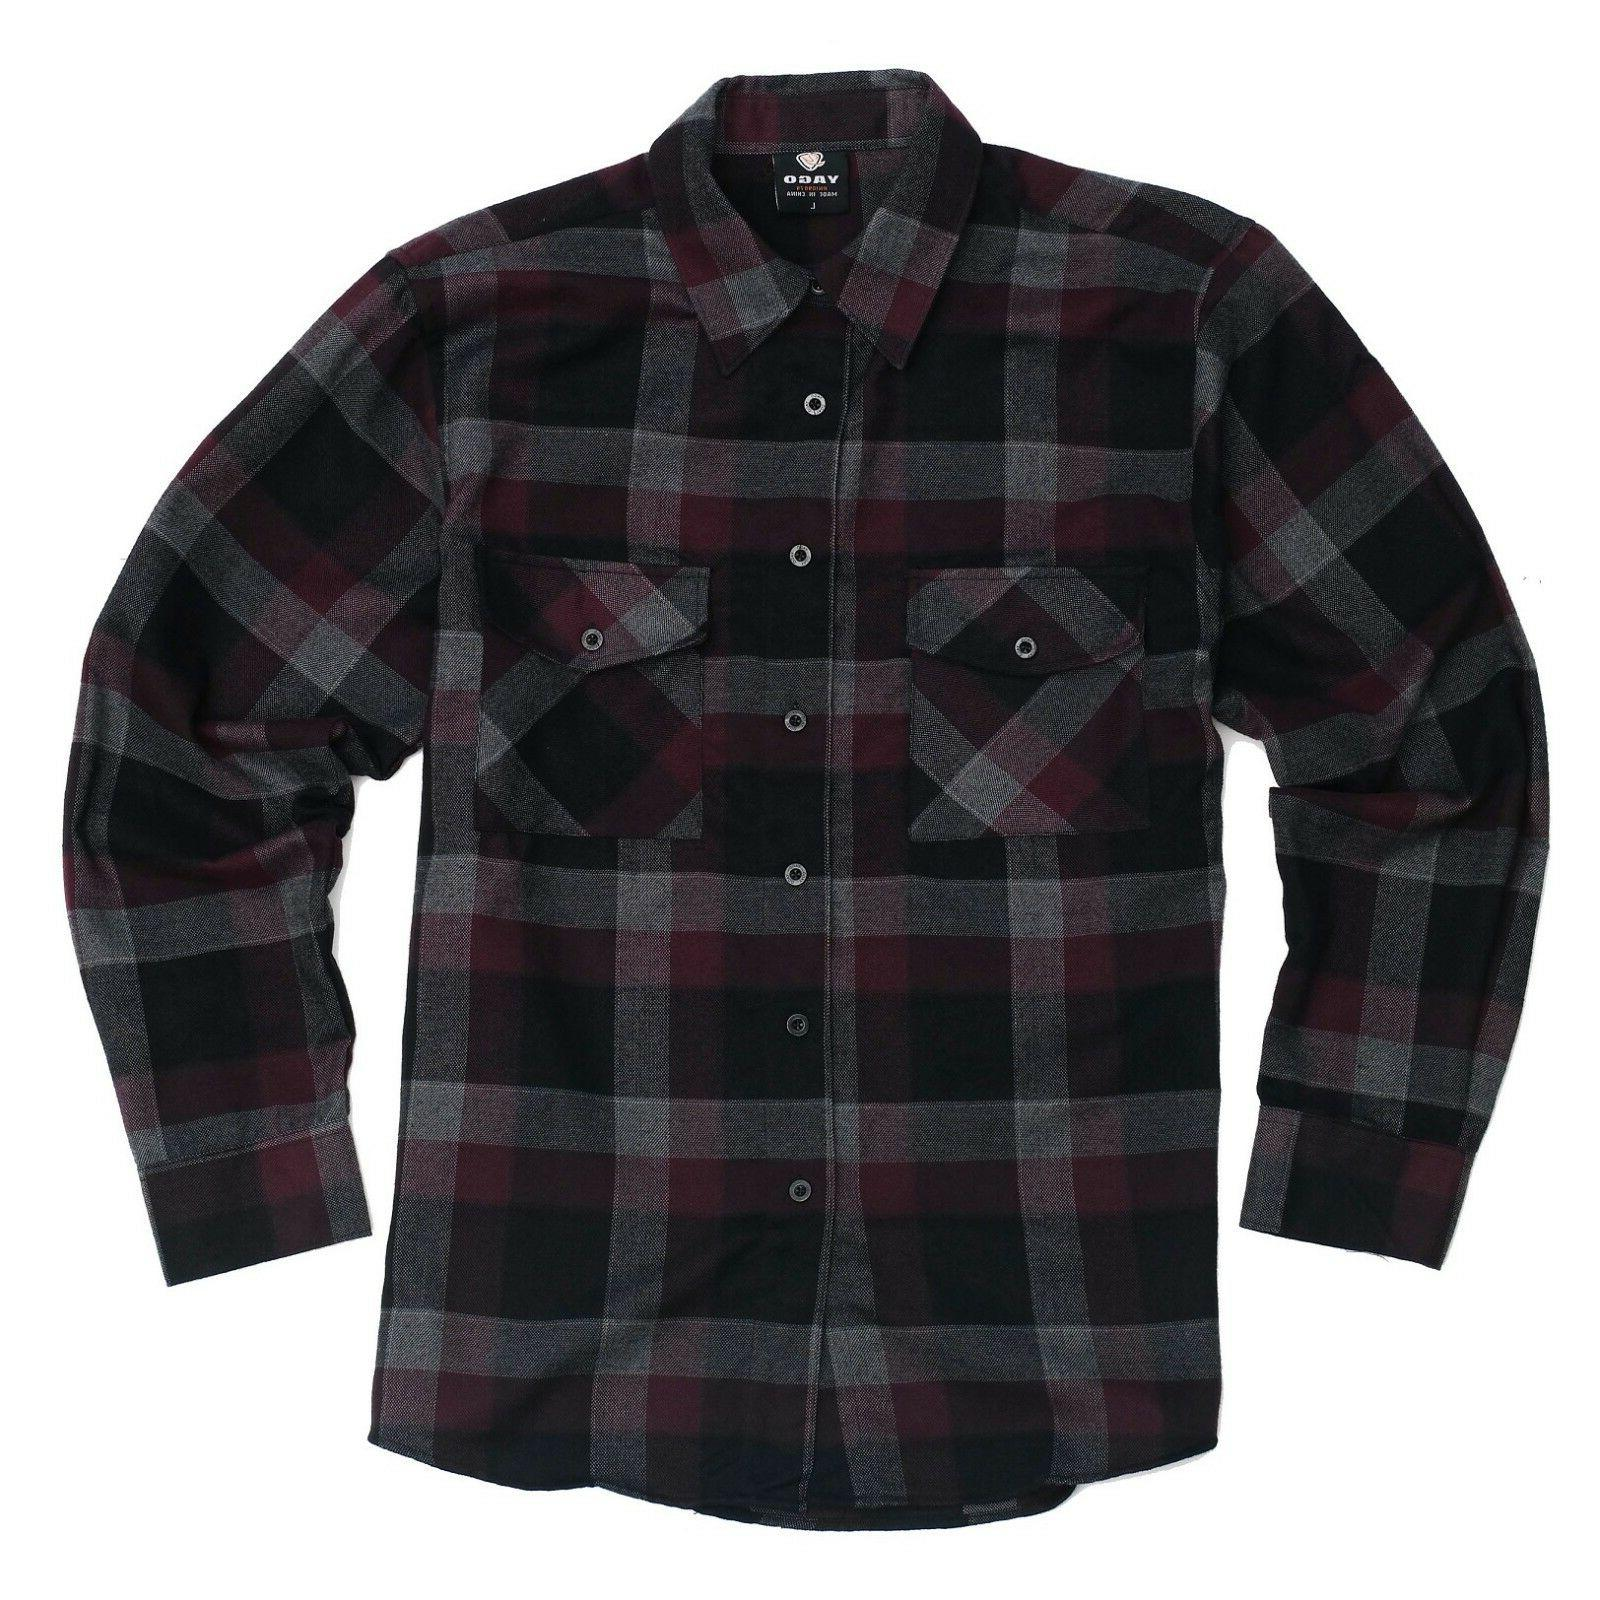 flannel long sleeve shirt burgundy grey black